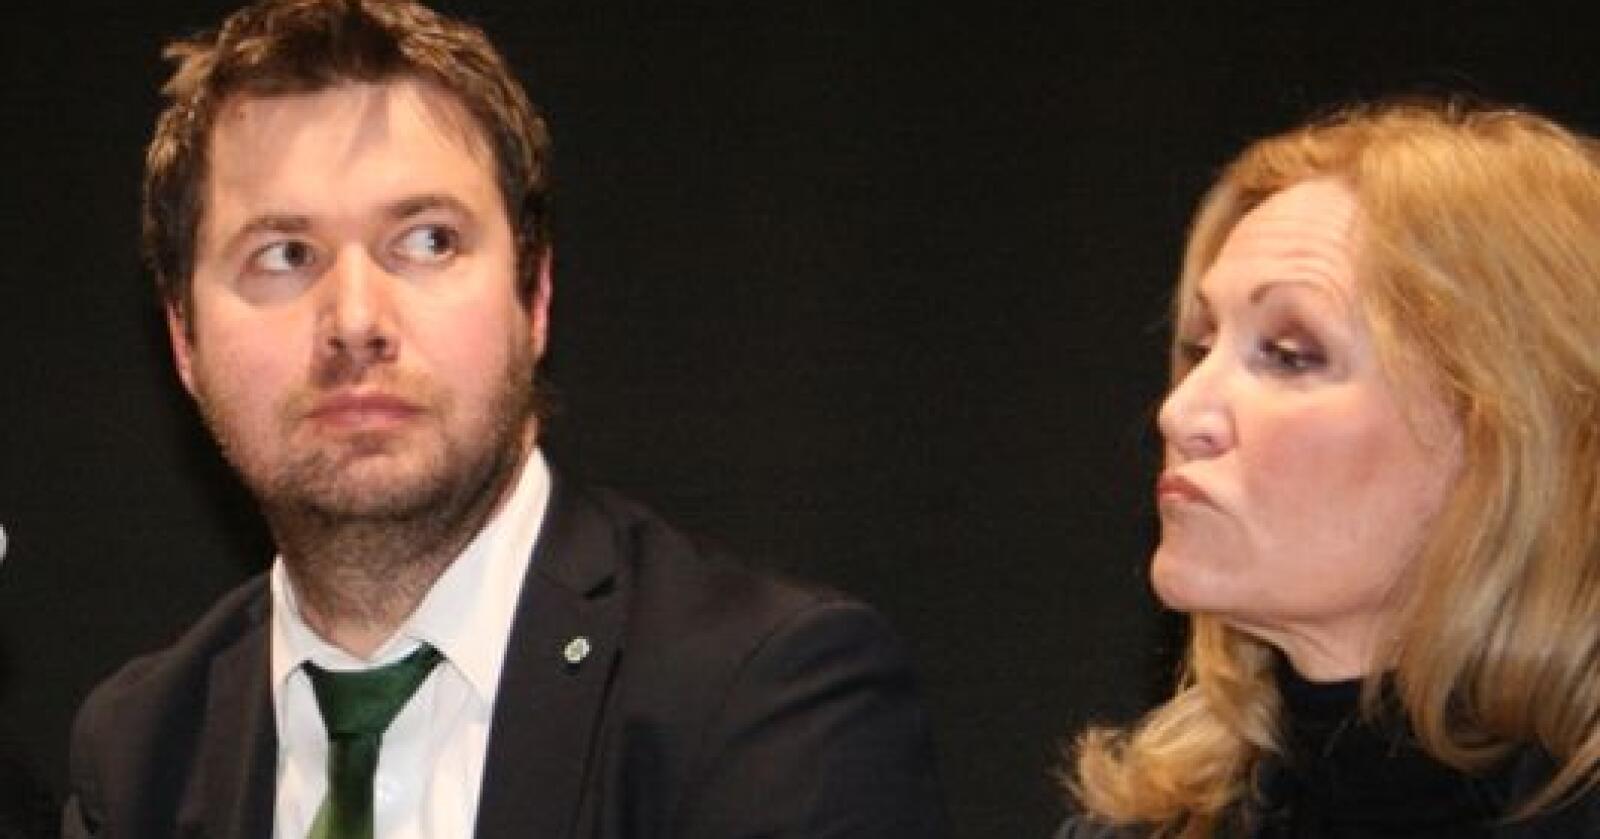 Sps næringspolitiske talsmann Geir Pollestad sammen med Pelsdyralslagets Wormdah under en debatt om pelsdyrnæringa i fjor. Foto: Bjarne Bekkeheien Aase